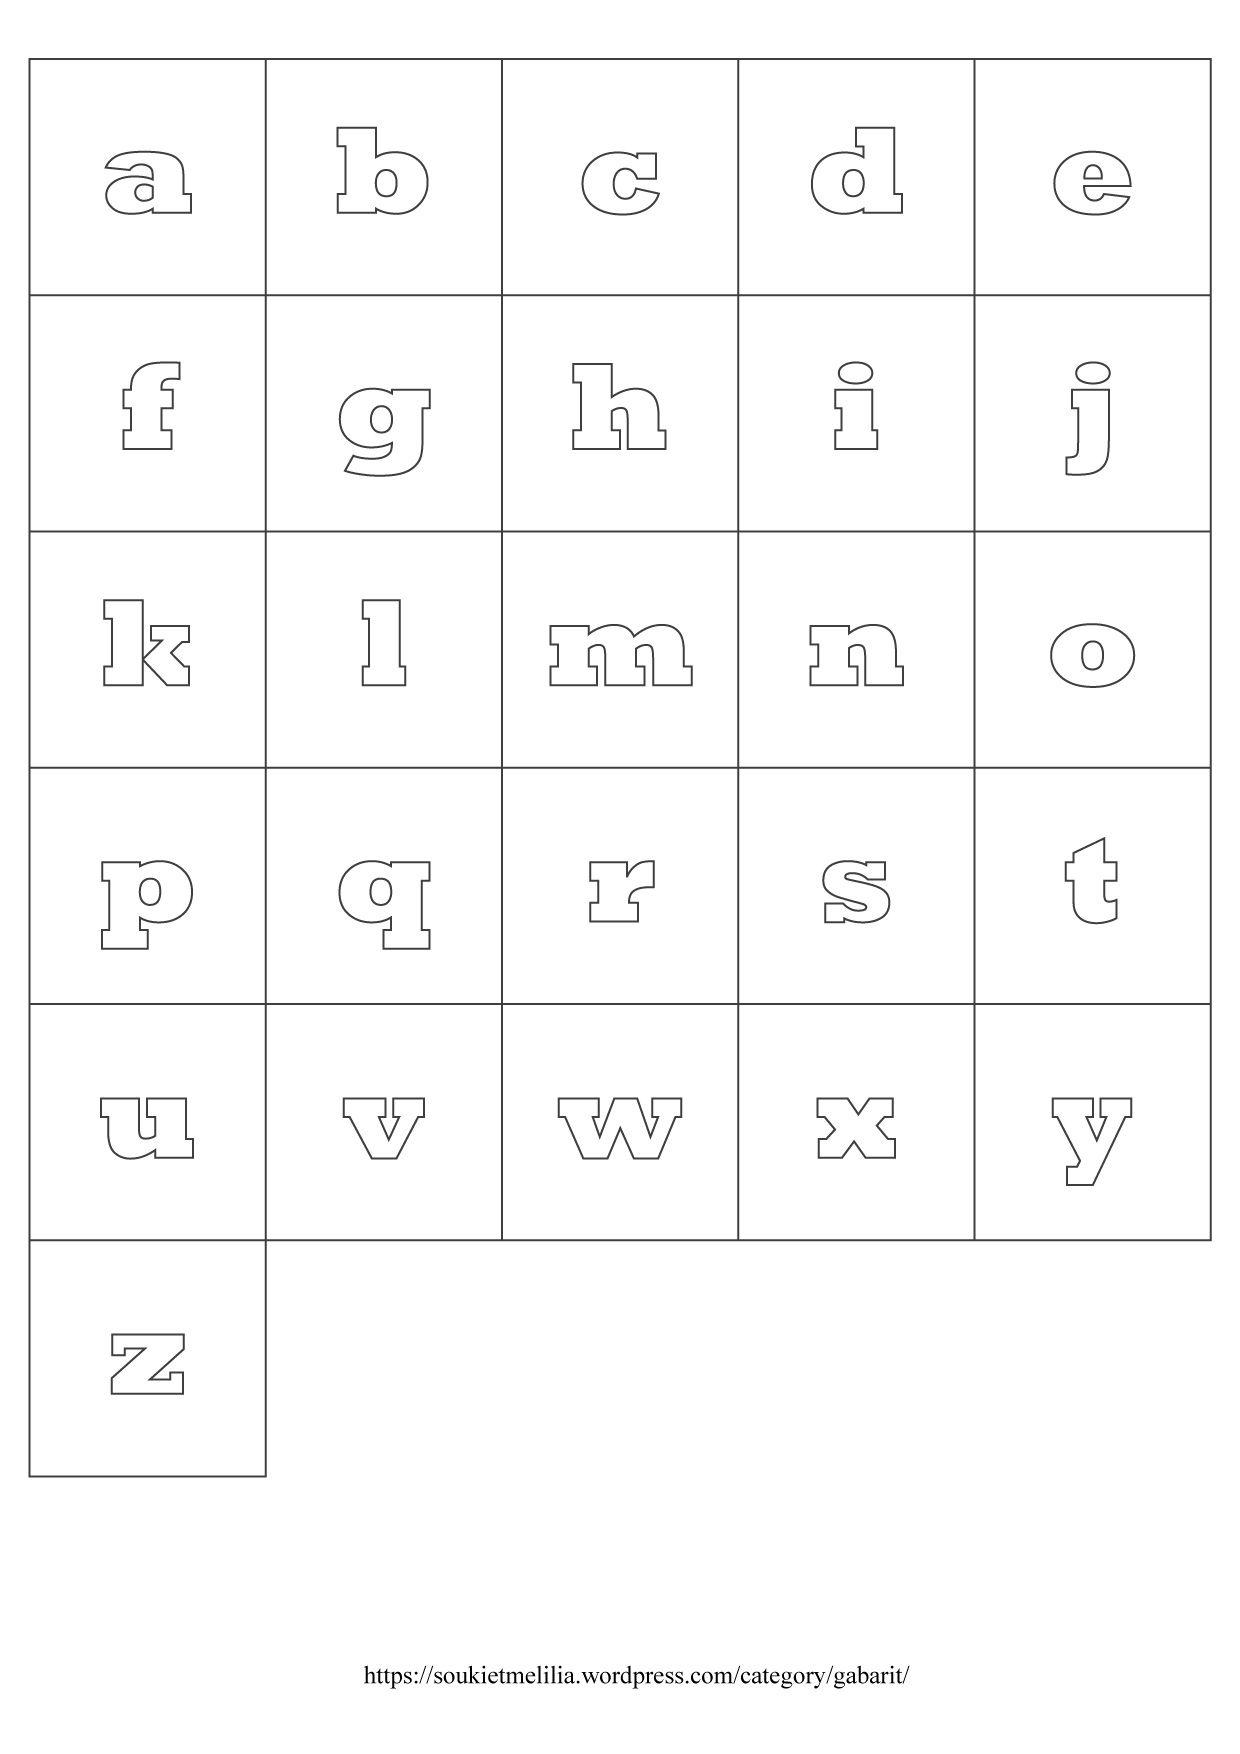 Gabarits Alphabet A Telecharger Au Format Pdf Lettre Alphabet A Imprimer Alphabet Alphabet A Imprimer